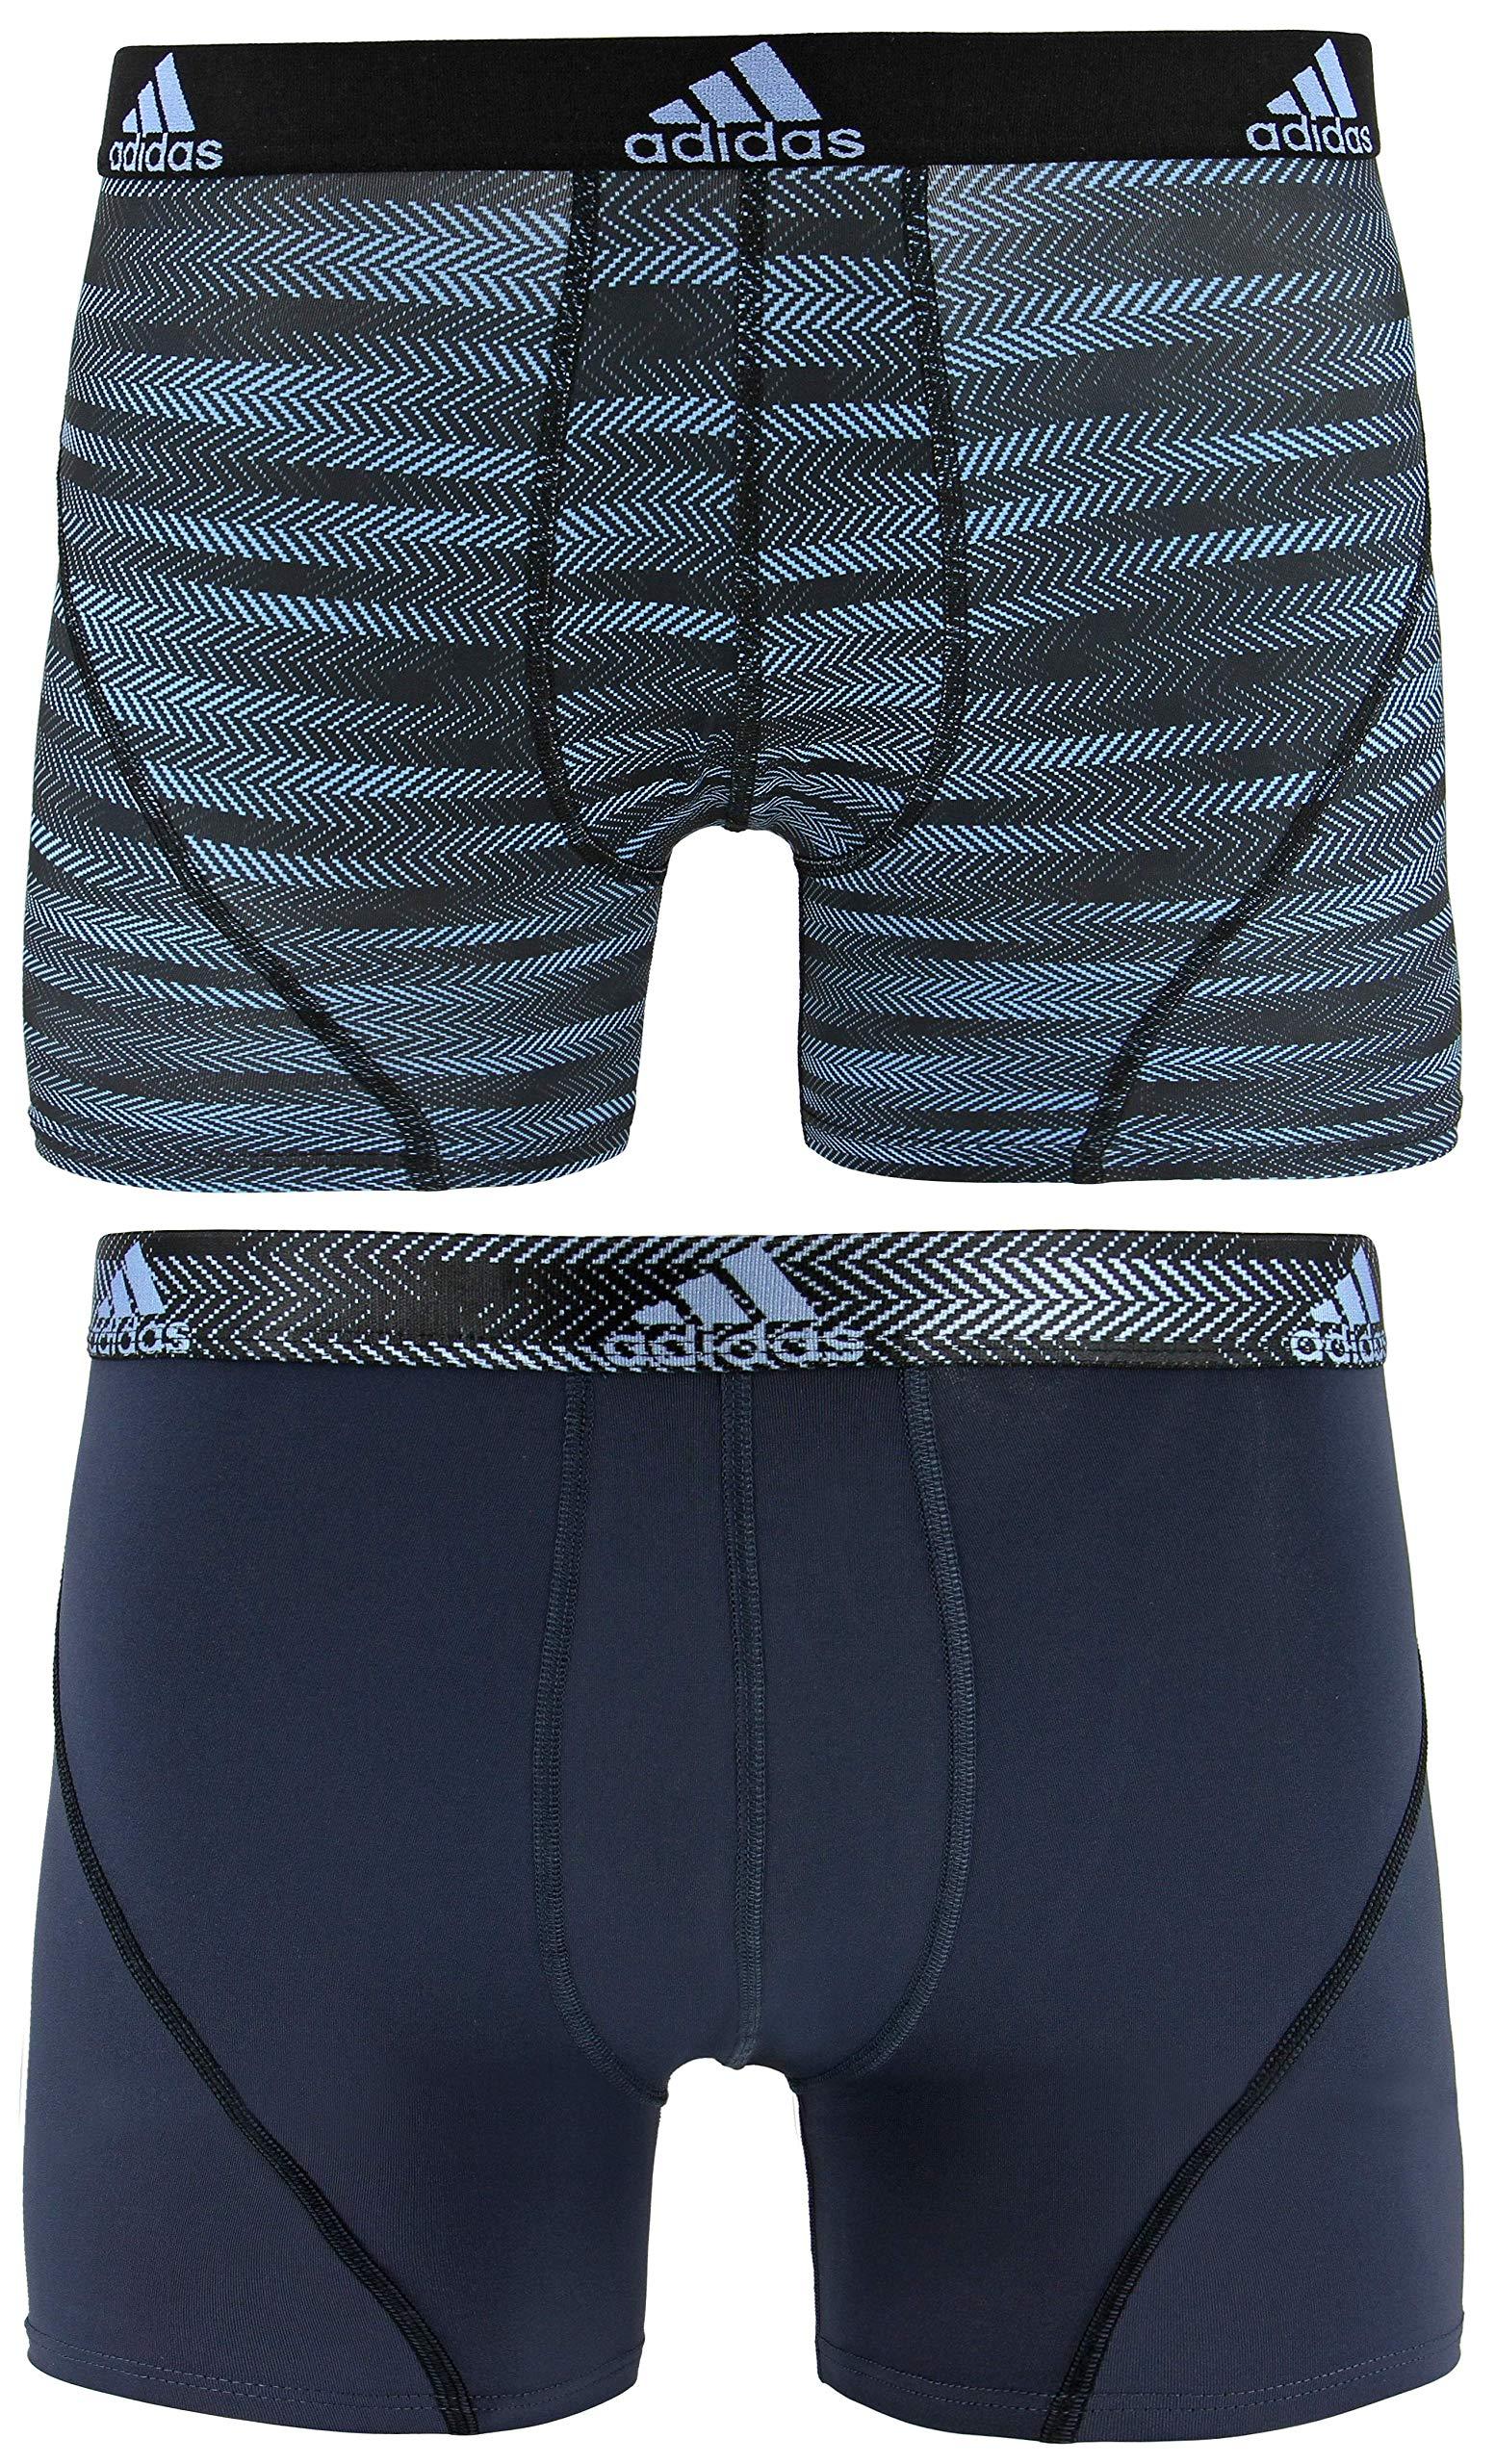 adidas Men's Sport Performance Trunk Underwear (2-Pack), Collegiate Light Blue Ratio Urban Sky Ratio, LARGE by adidas